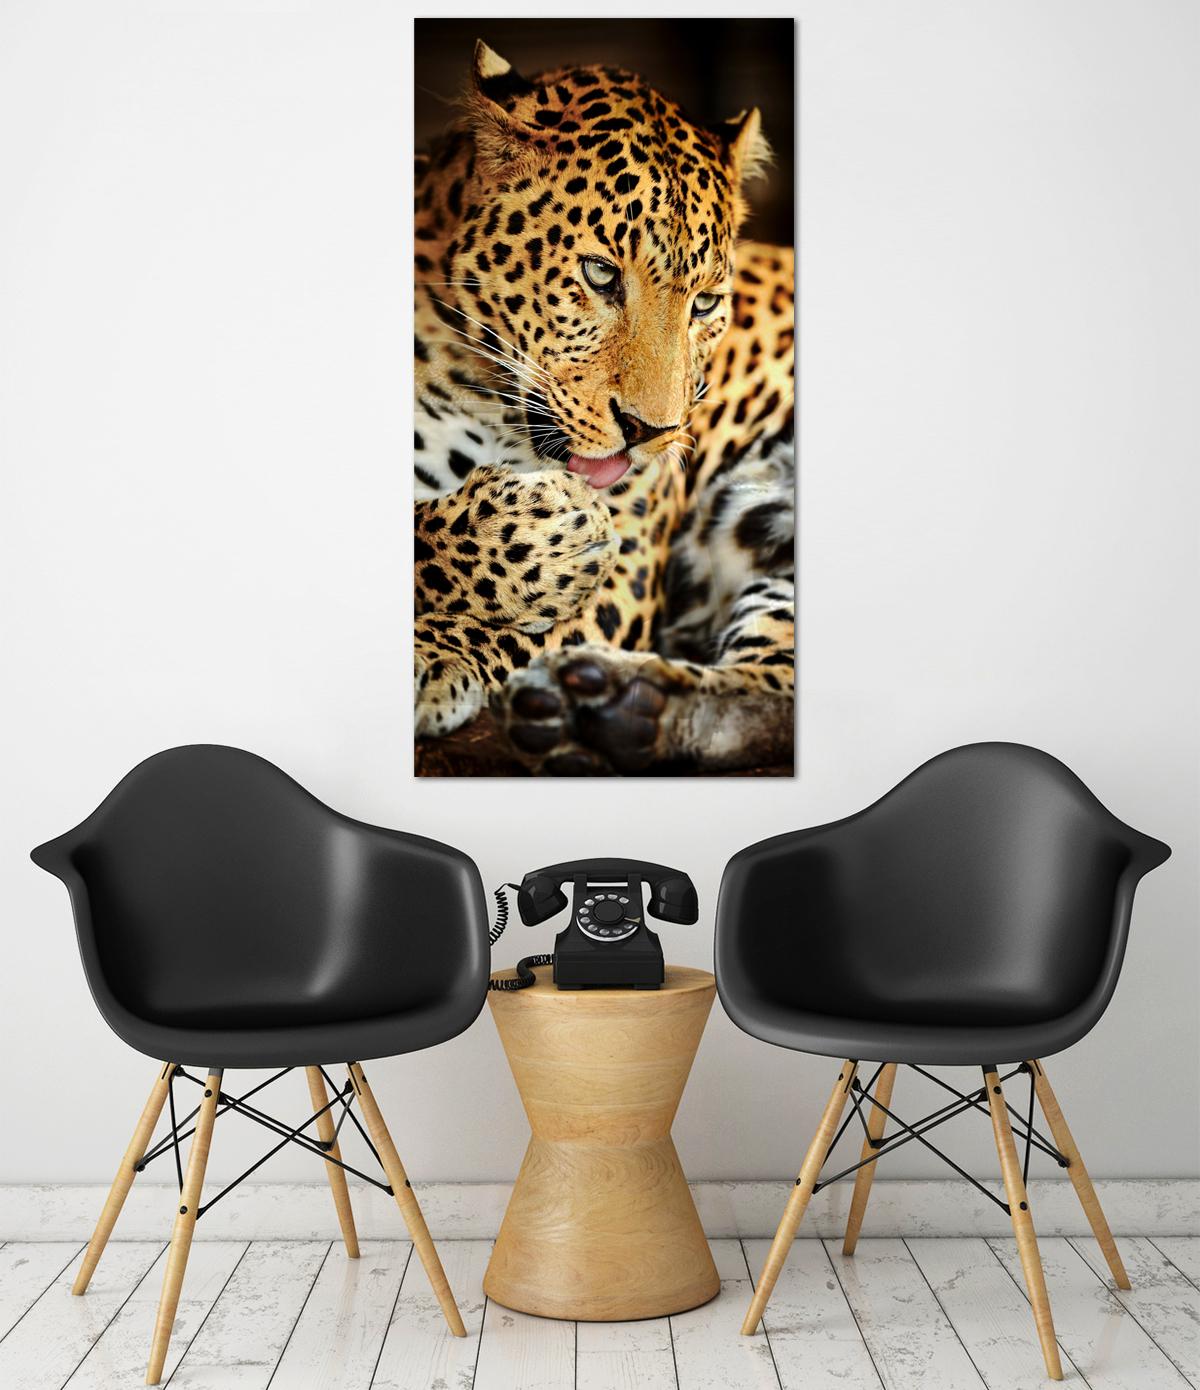 Obraz Leopard na zrkadle Mirrora 40 - 100x50 cm (Obrazy Mirrora)